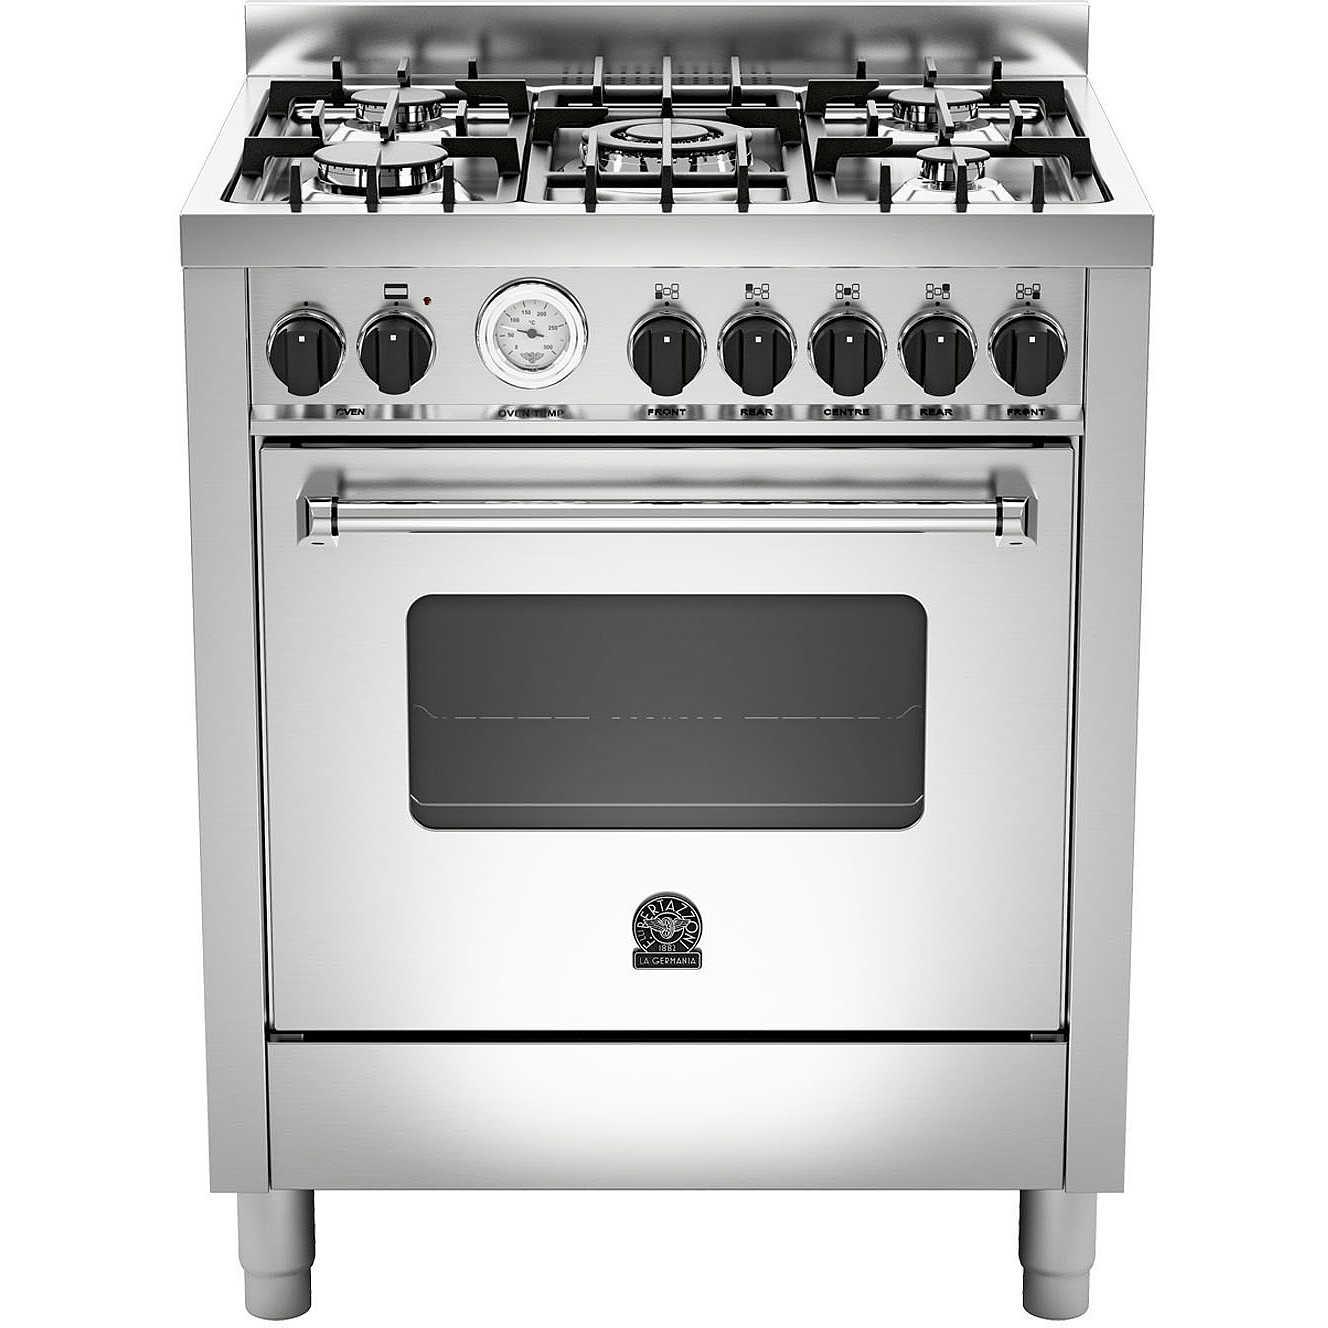 H6TMH2AF (X) IT Hotpoint/Ariston cucina 60x60 4 fuochi a gas forno ...